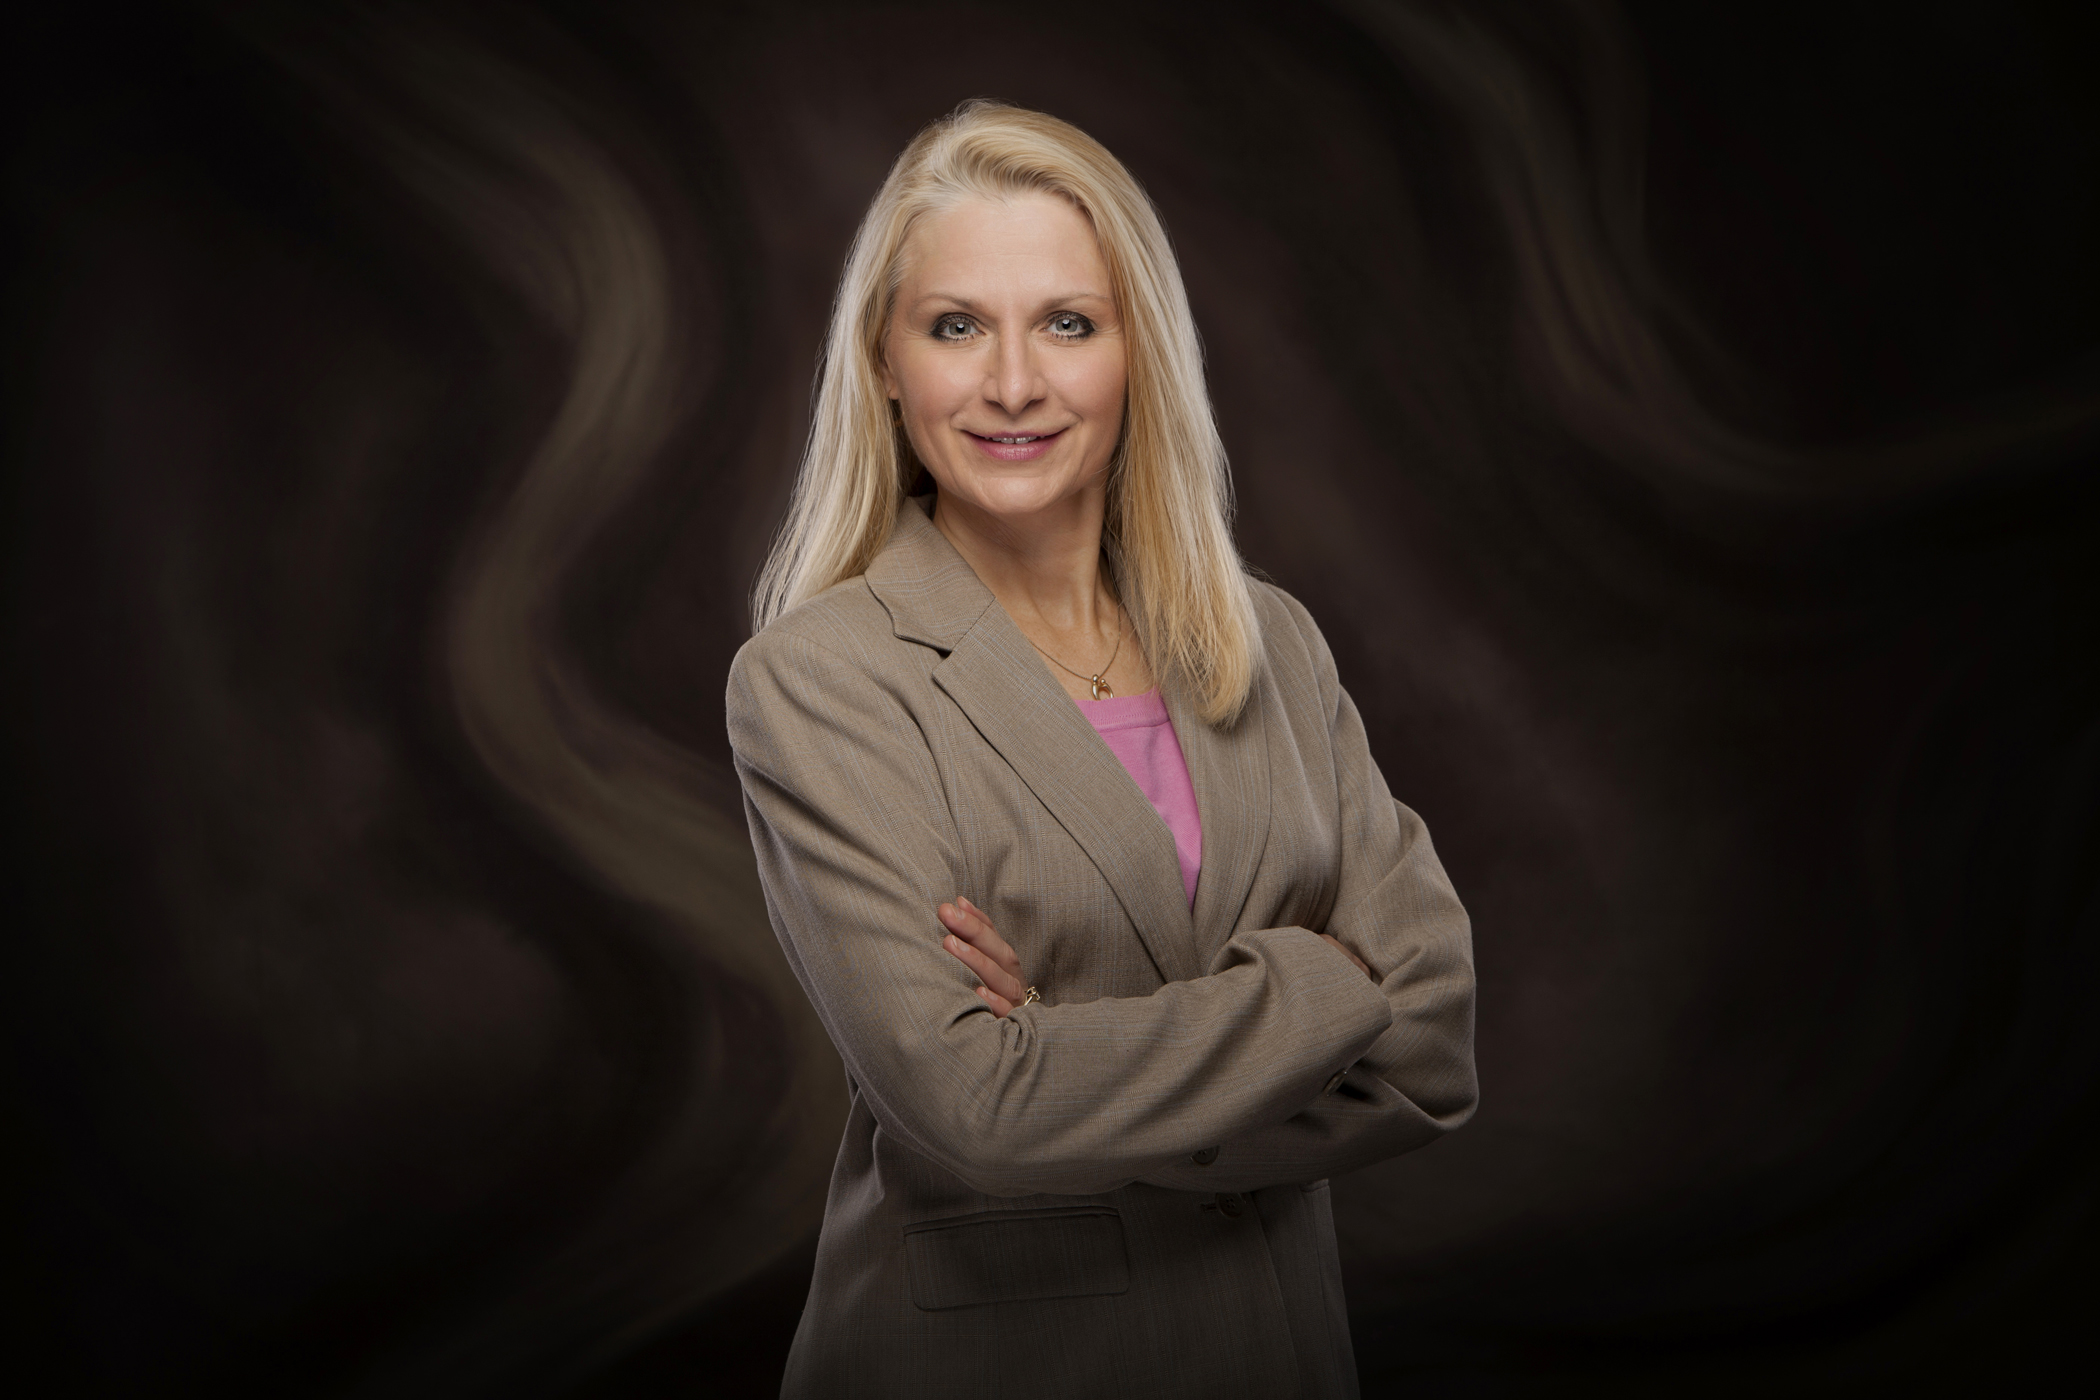 Linda D. Kruszka